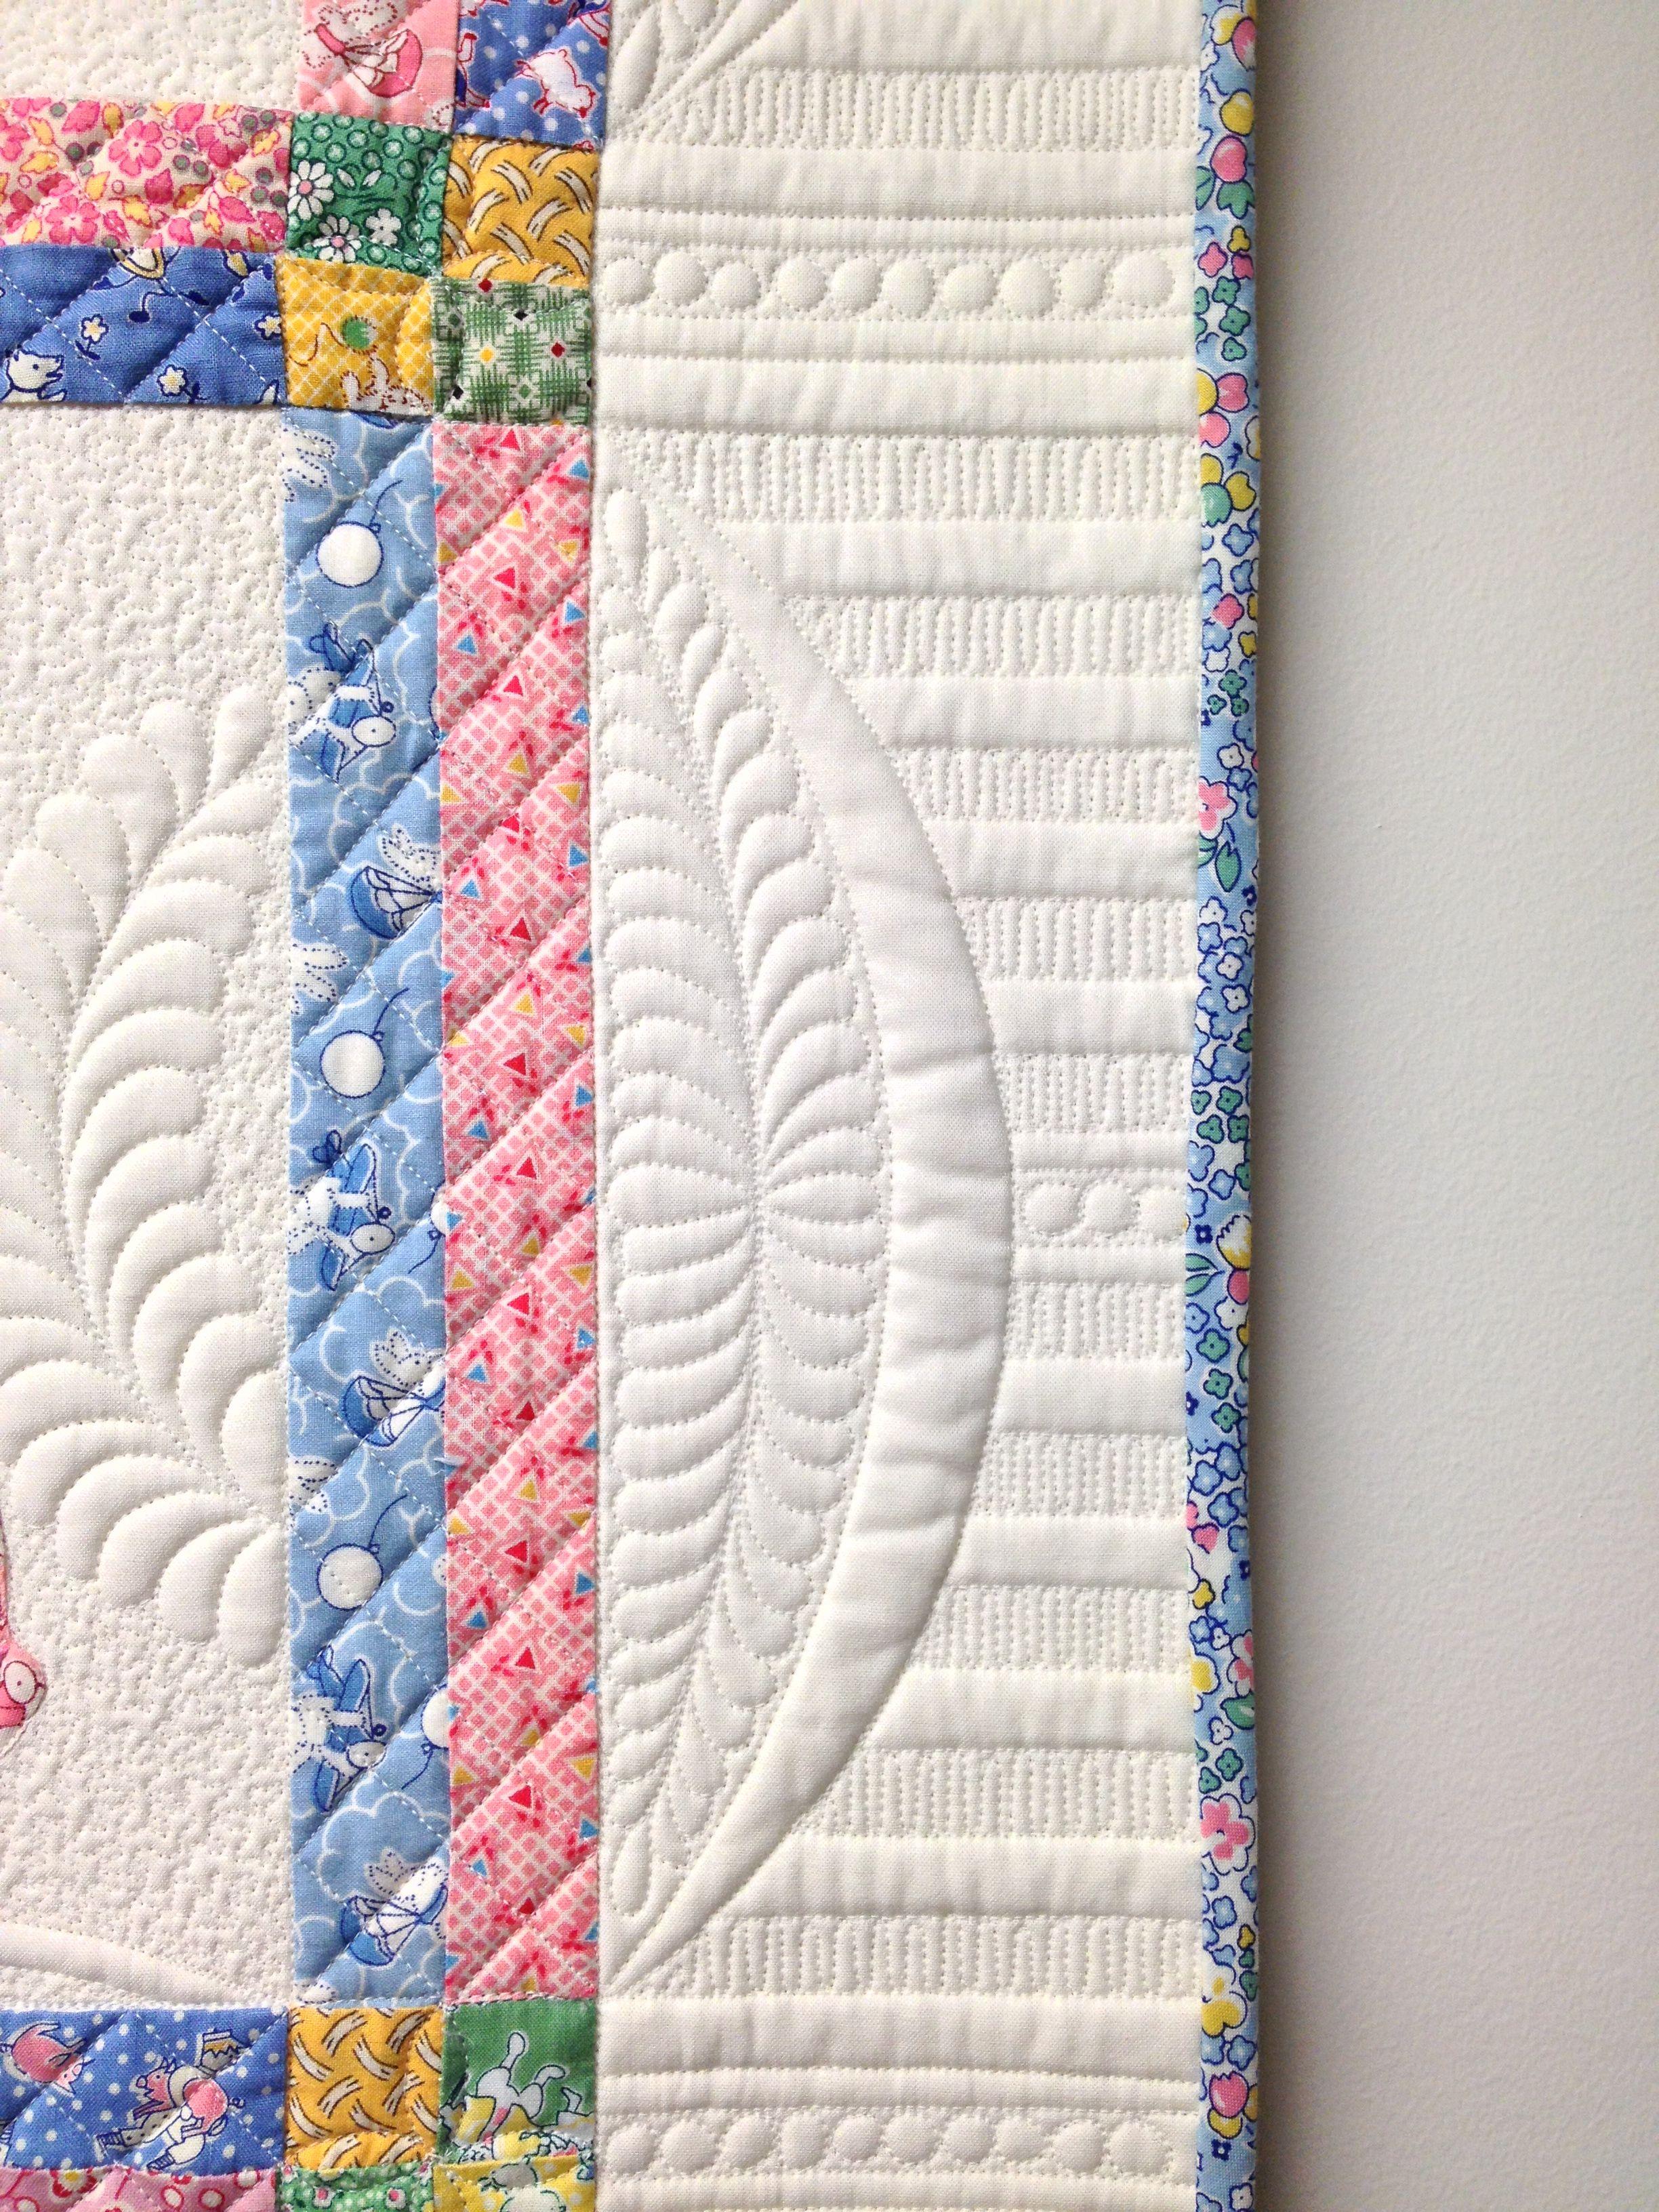 linda hracka quilt border sashing ideas pinterest quilt border